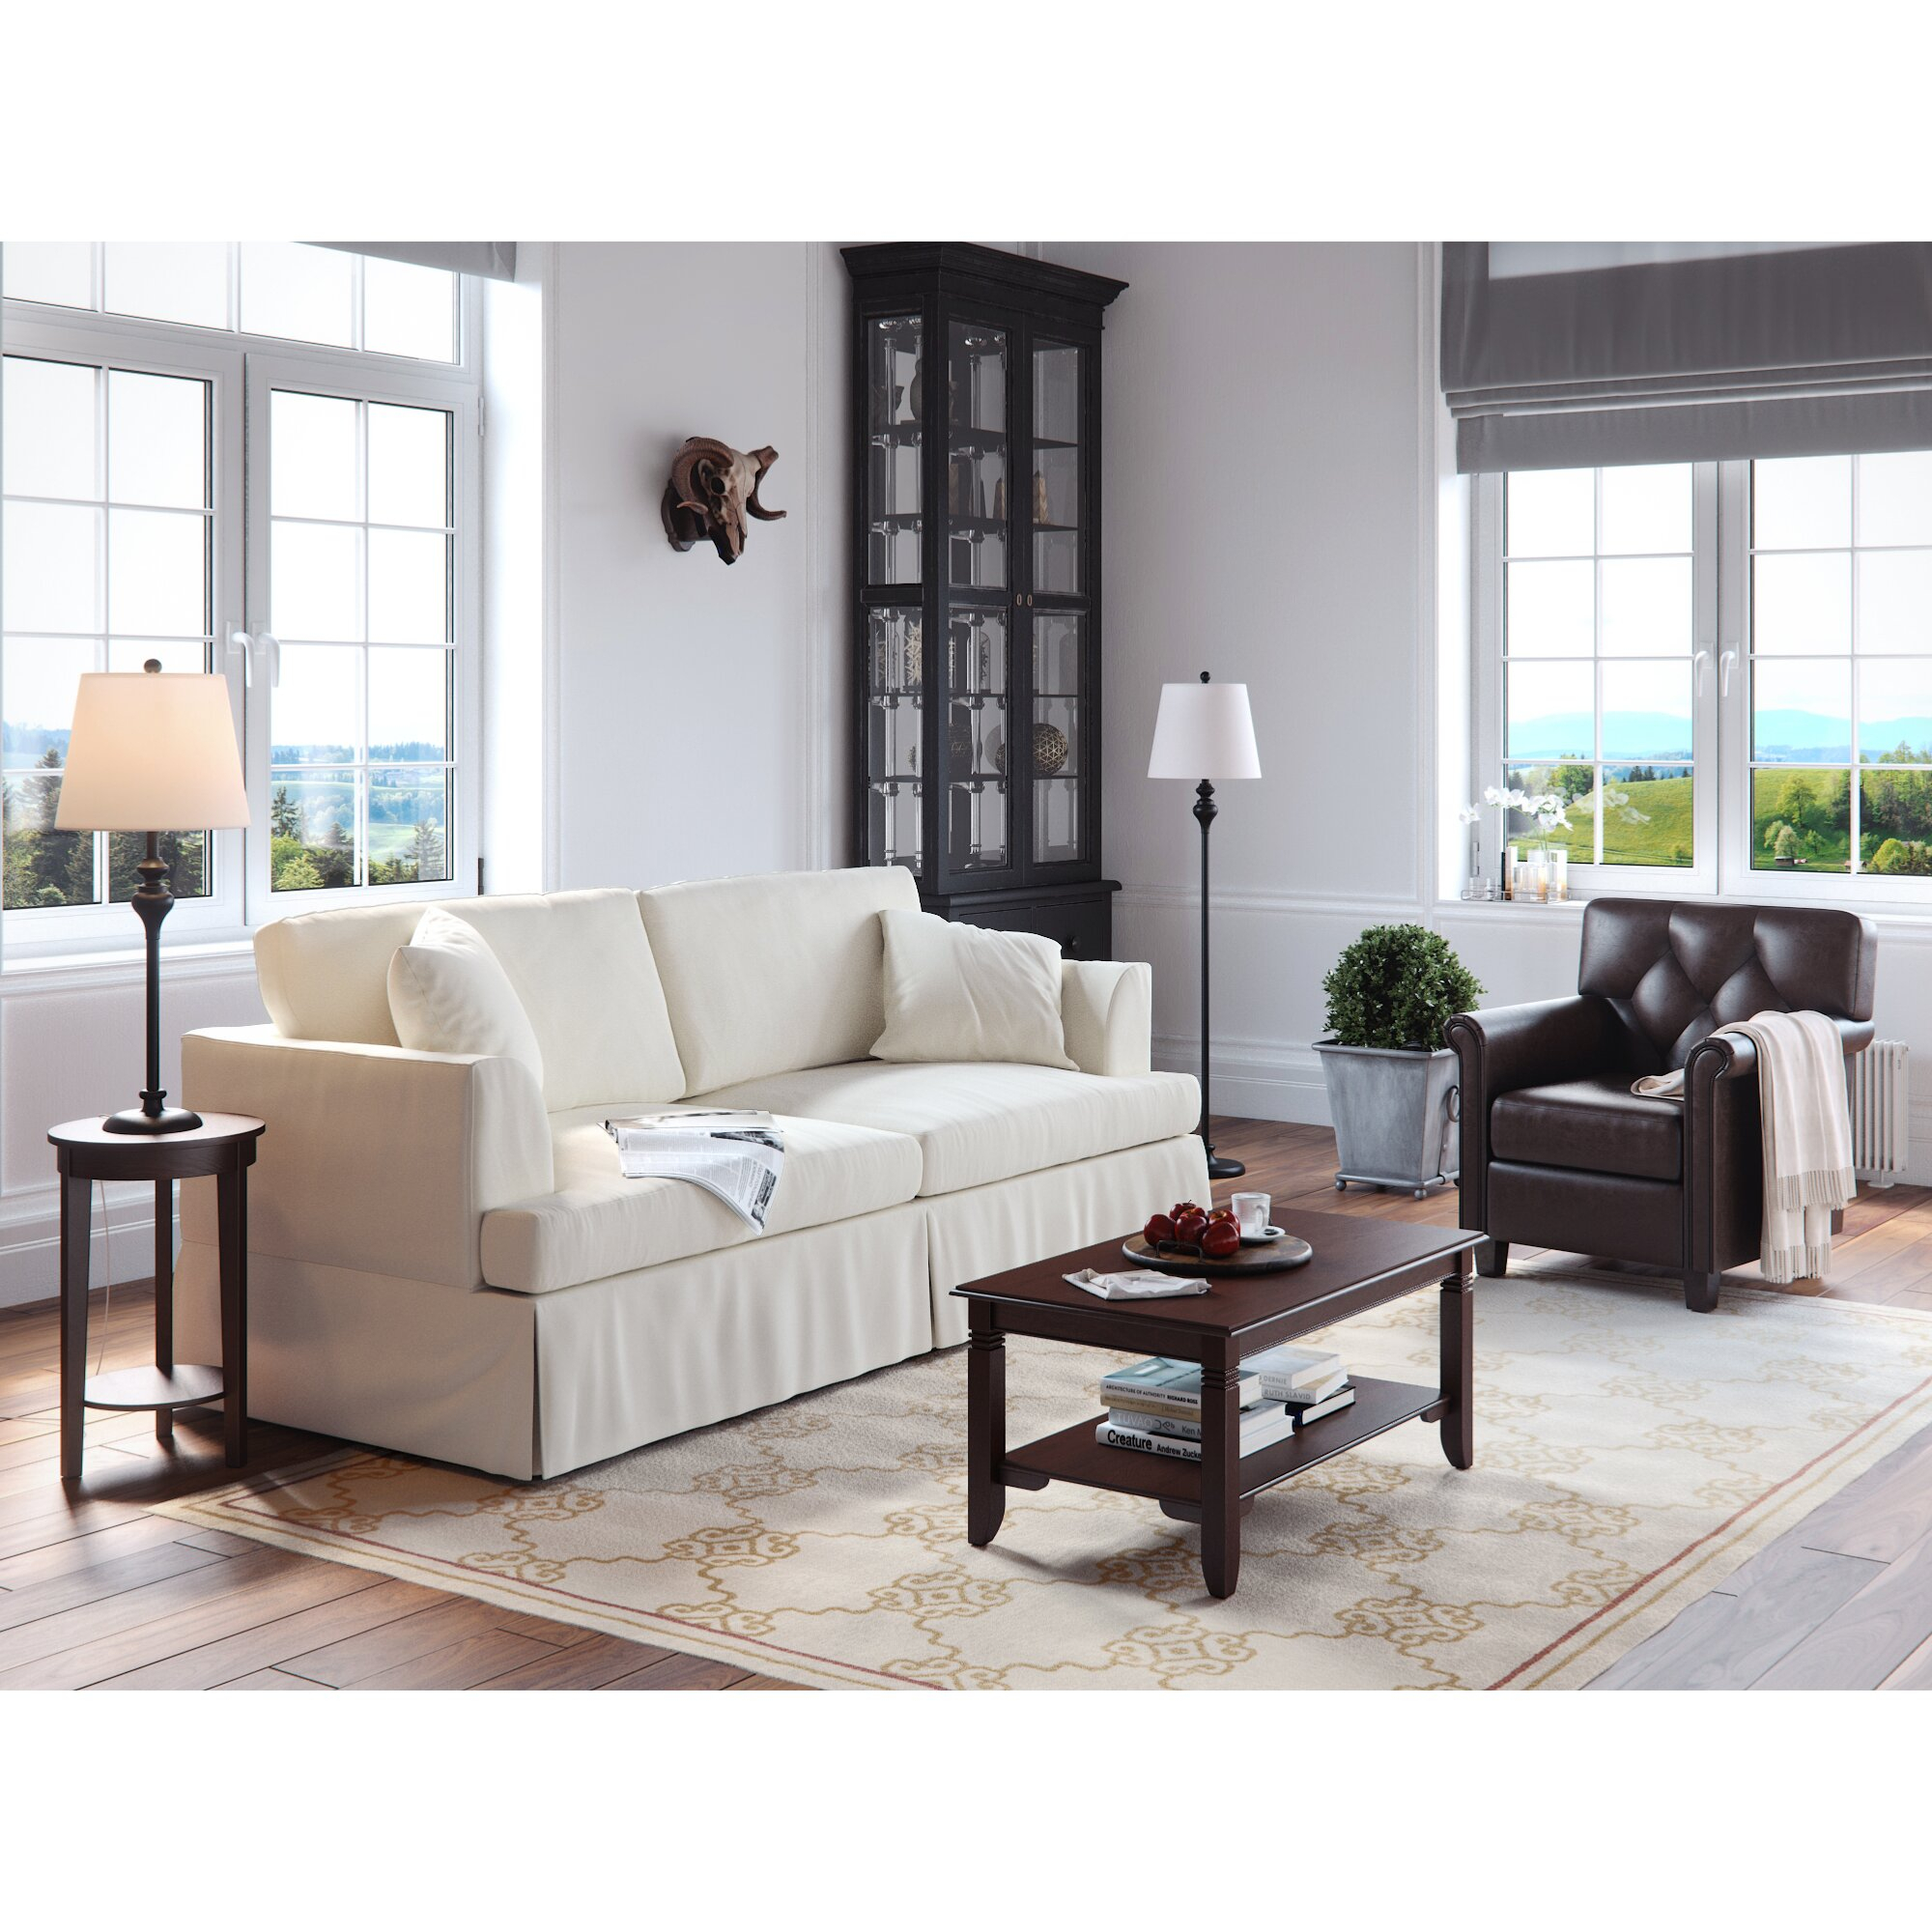 Wayfair Custom Upholstery Carly Sofa & Reviews   Wayfair Throughout Customized Sofas (View 4 of 15)